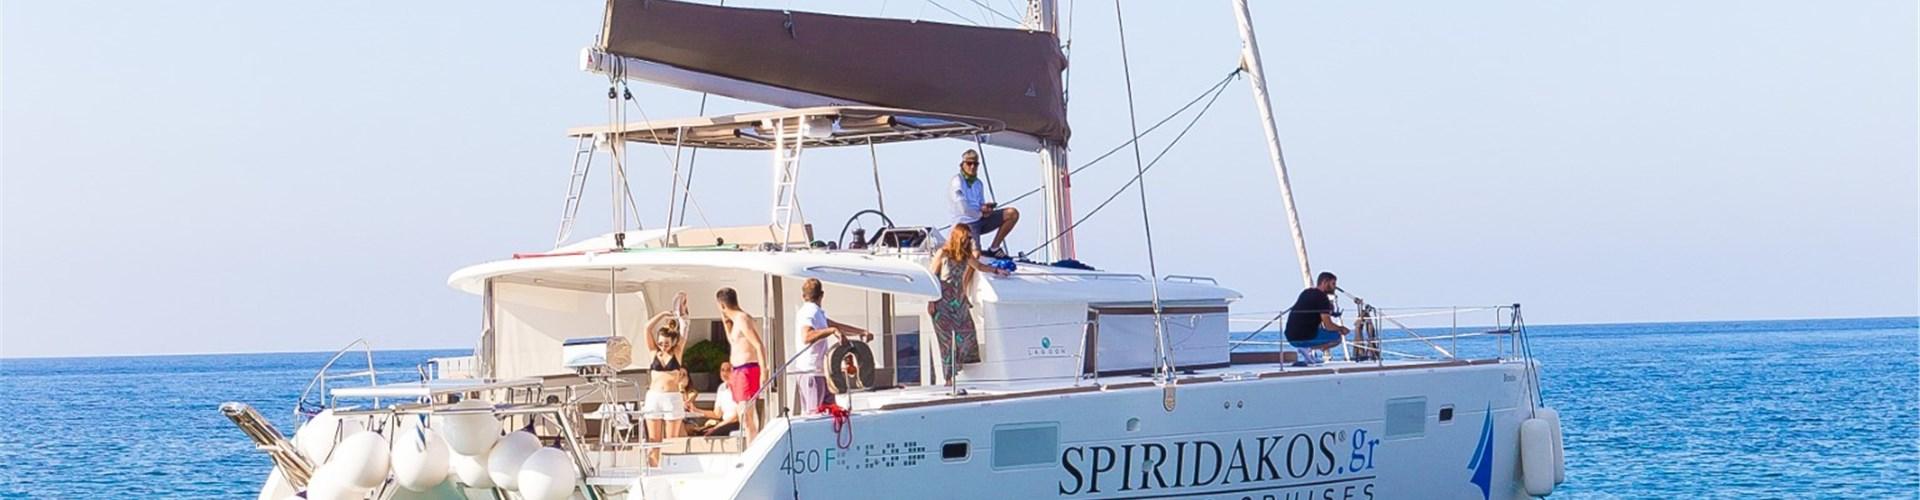 Photo of Catamaran Cruise in Santorini with Greek Food & Drinks